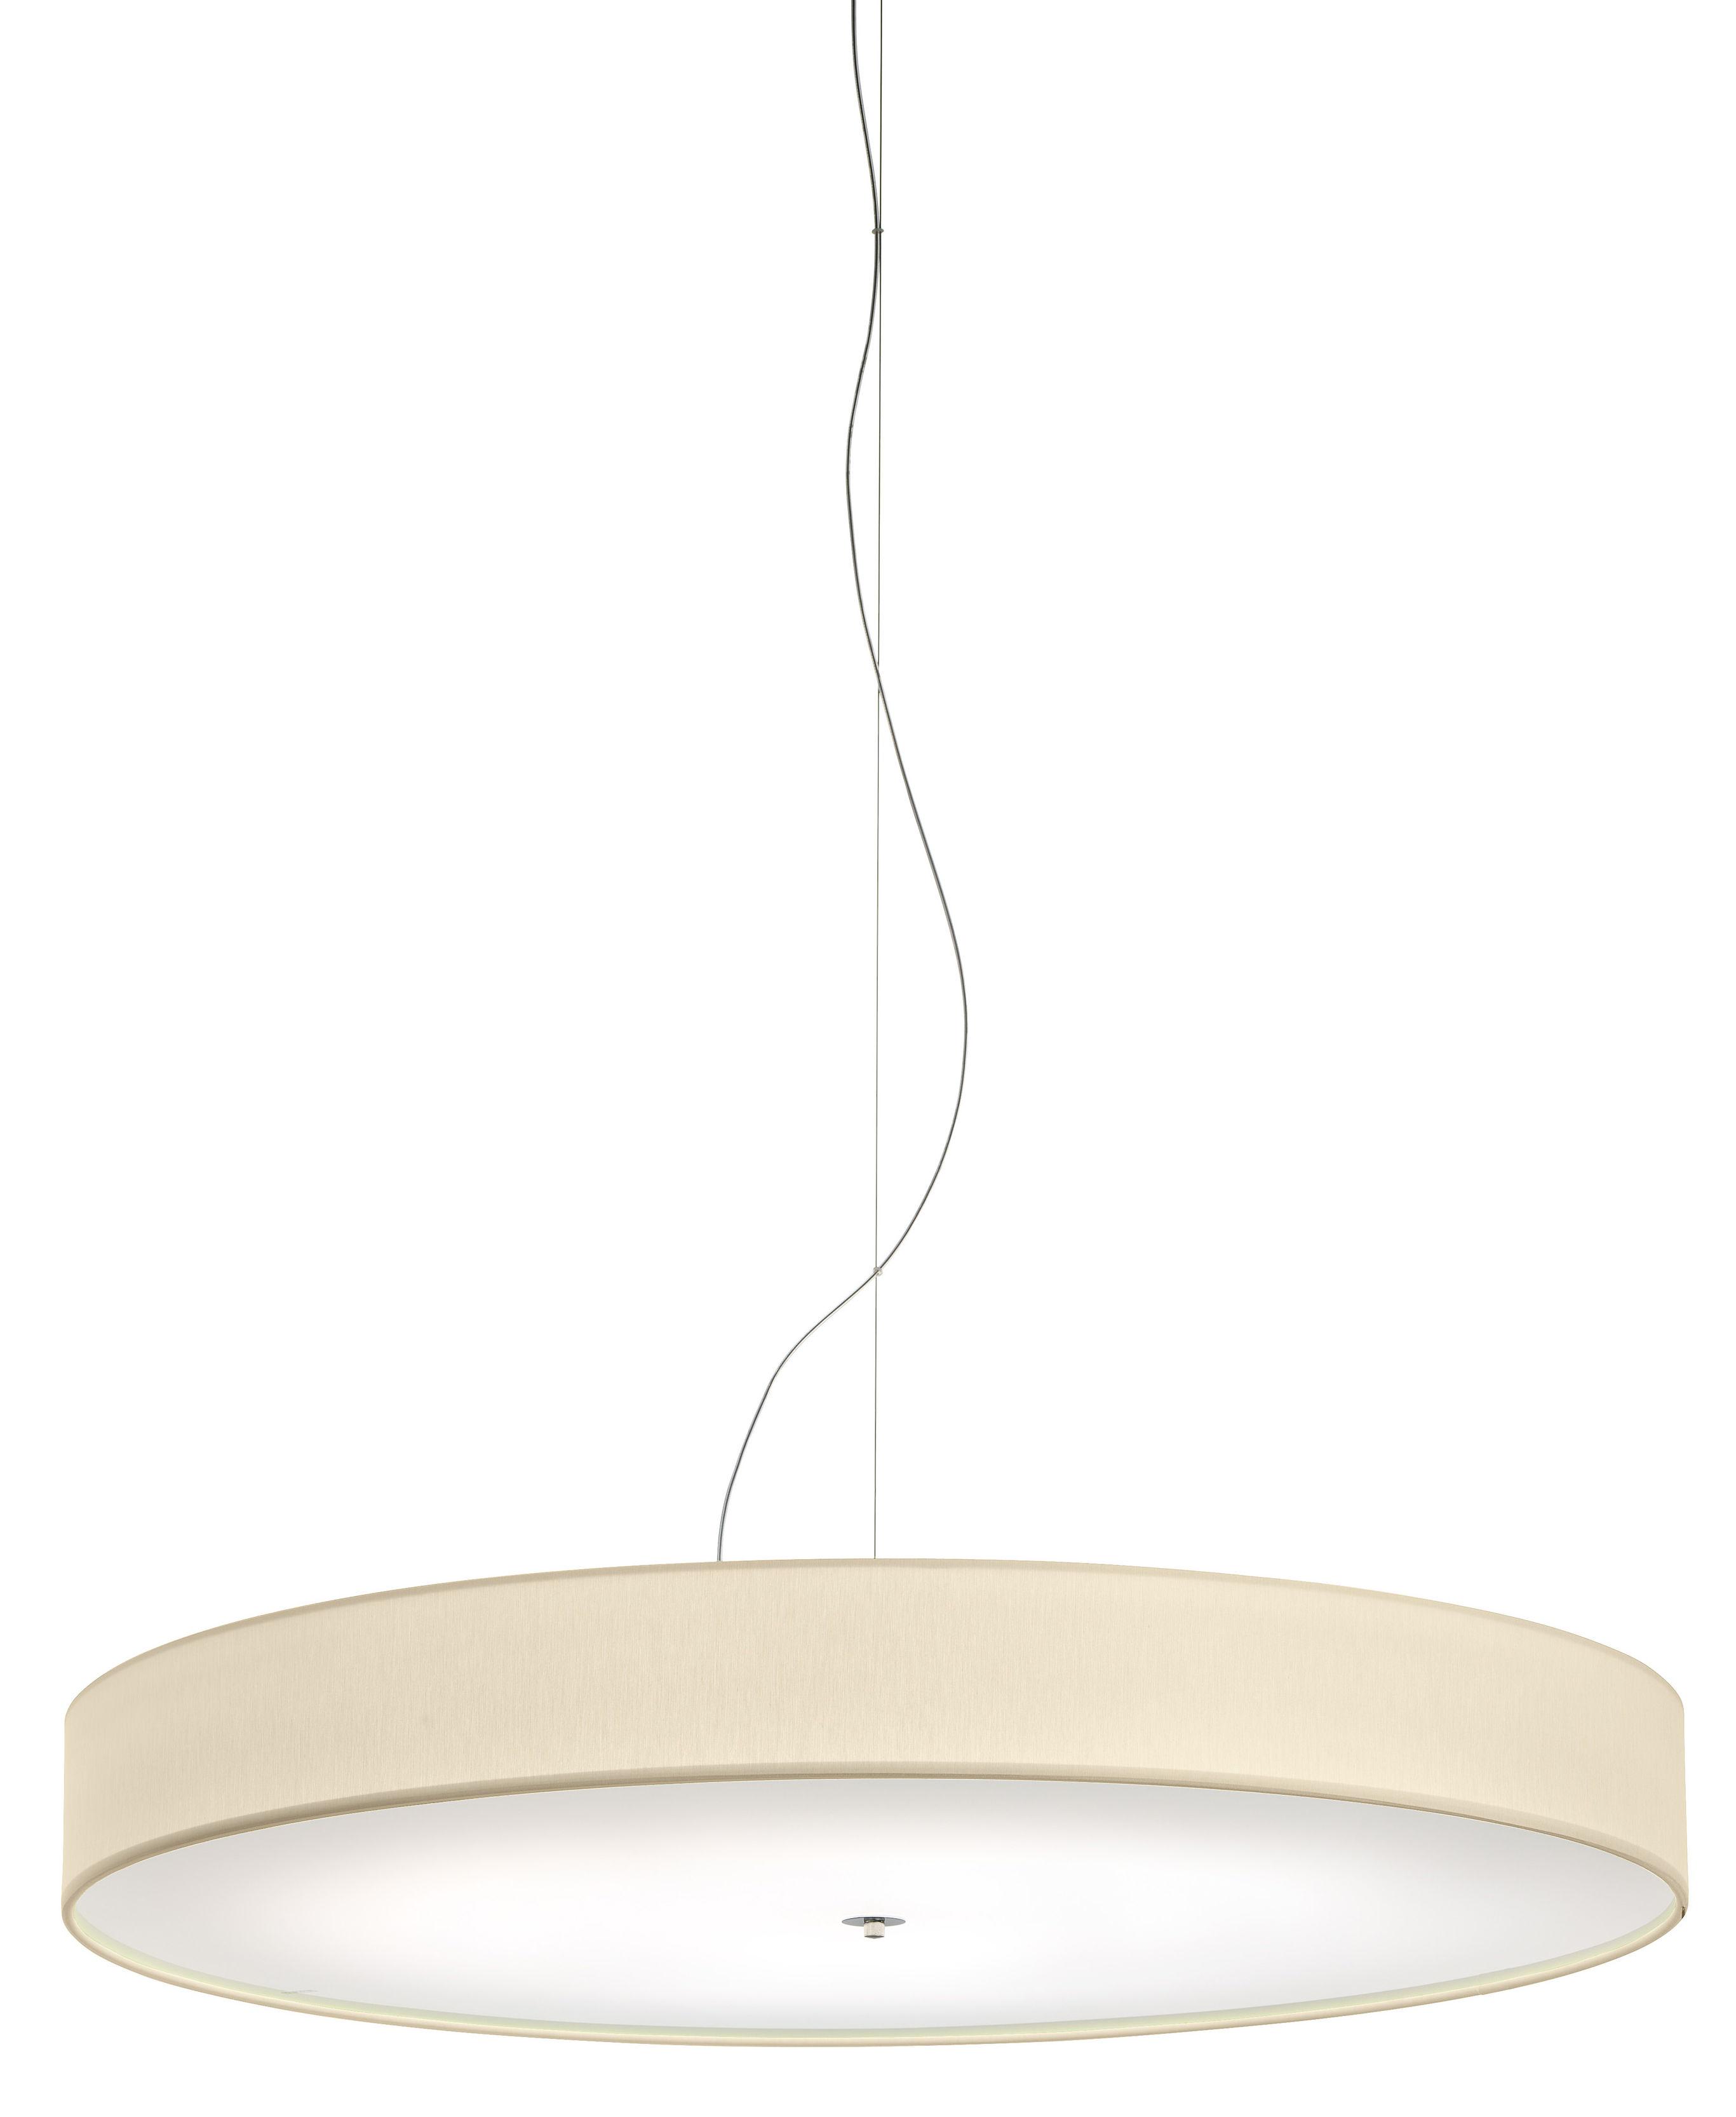 Lighting - Pendant Lighting - Discovolante LED Pendant - / Ø 60 cm by Modoluce - Cream - Cotton, Plexiglas